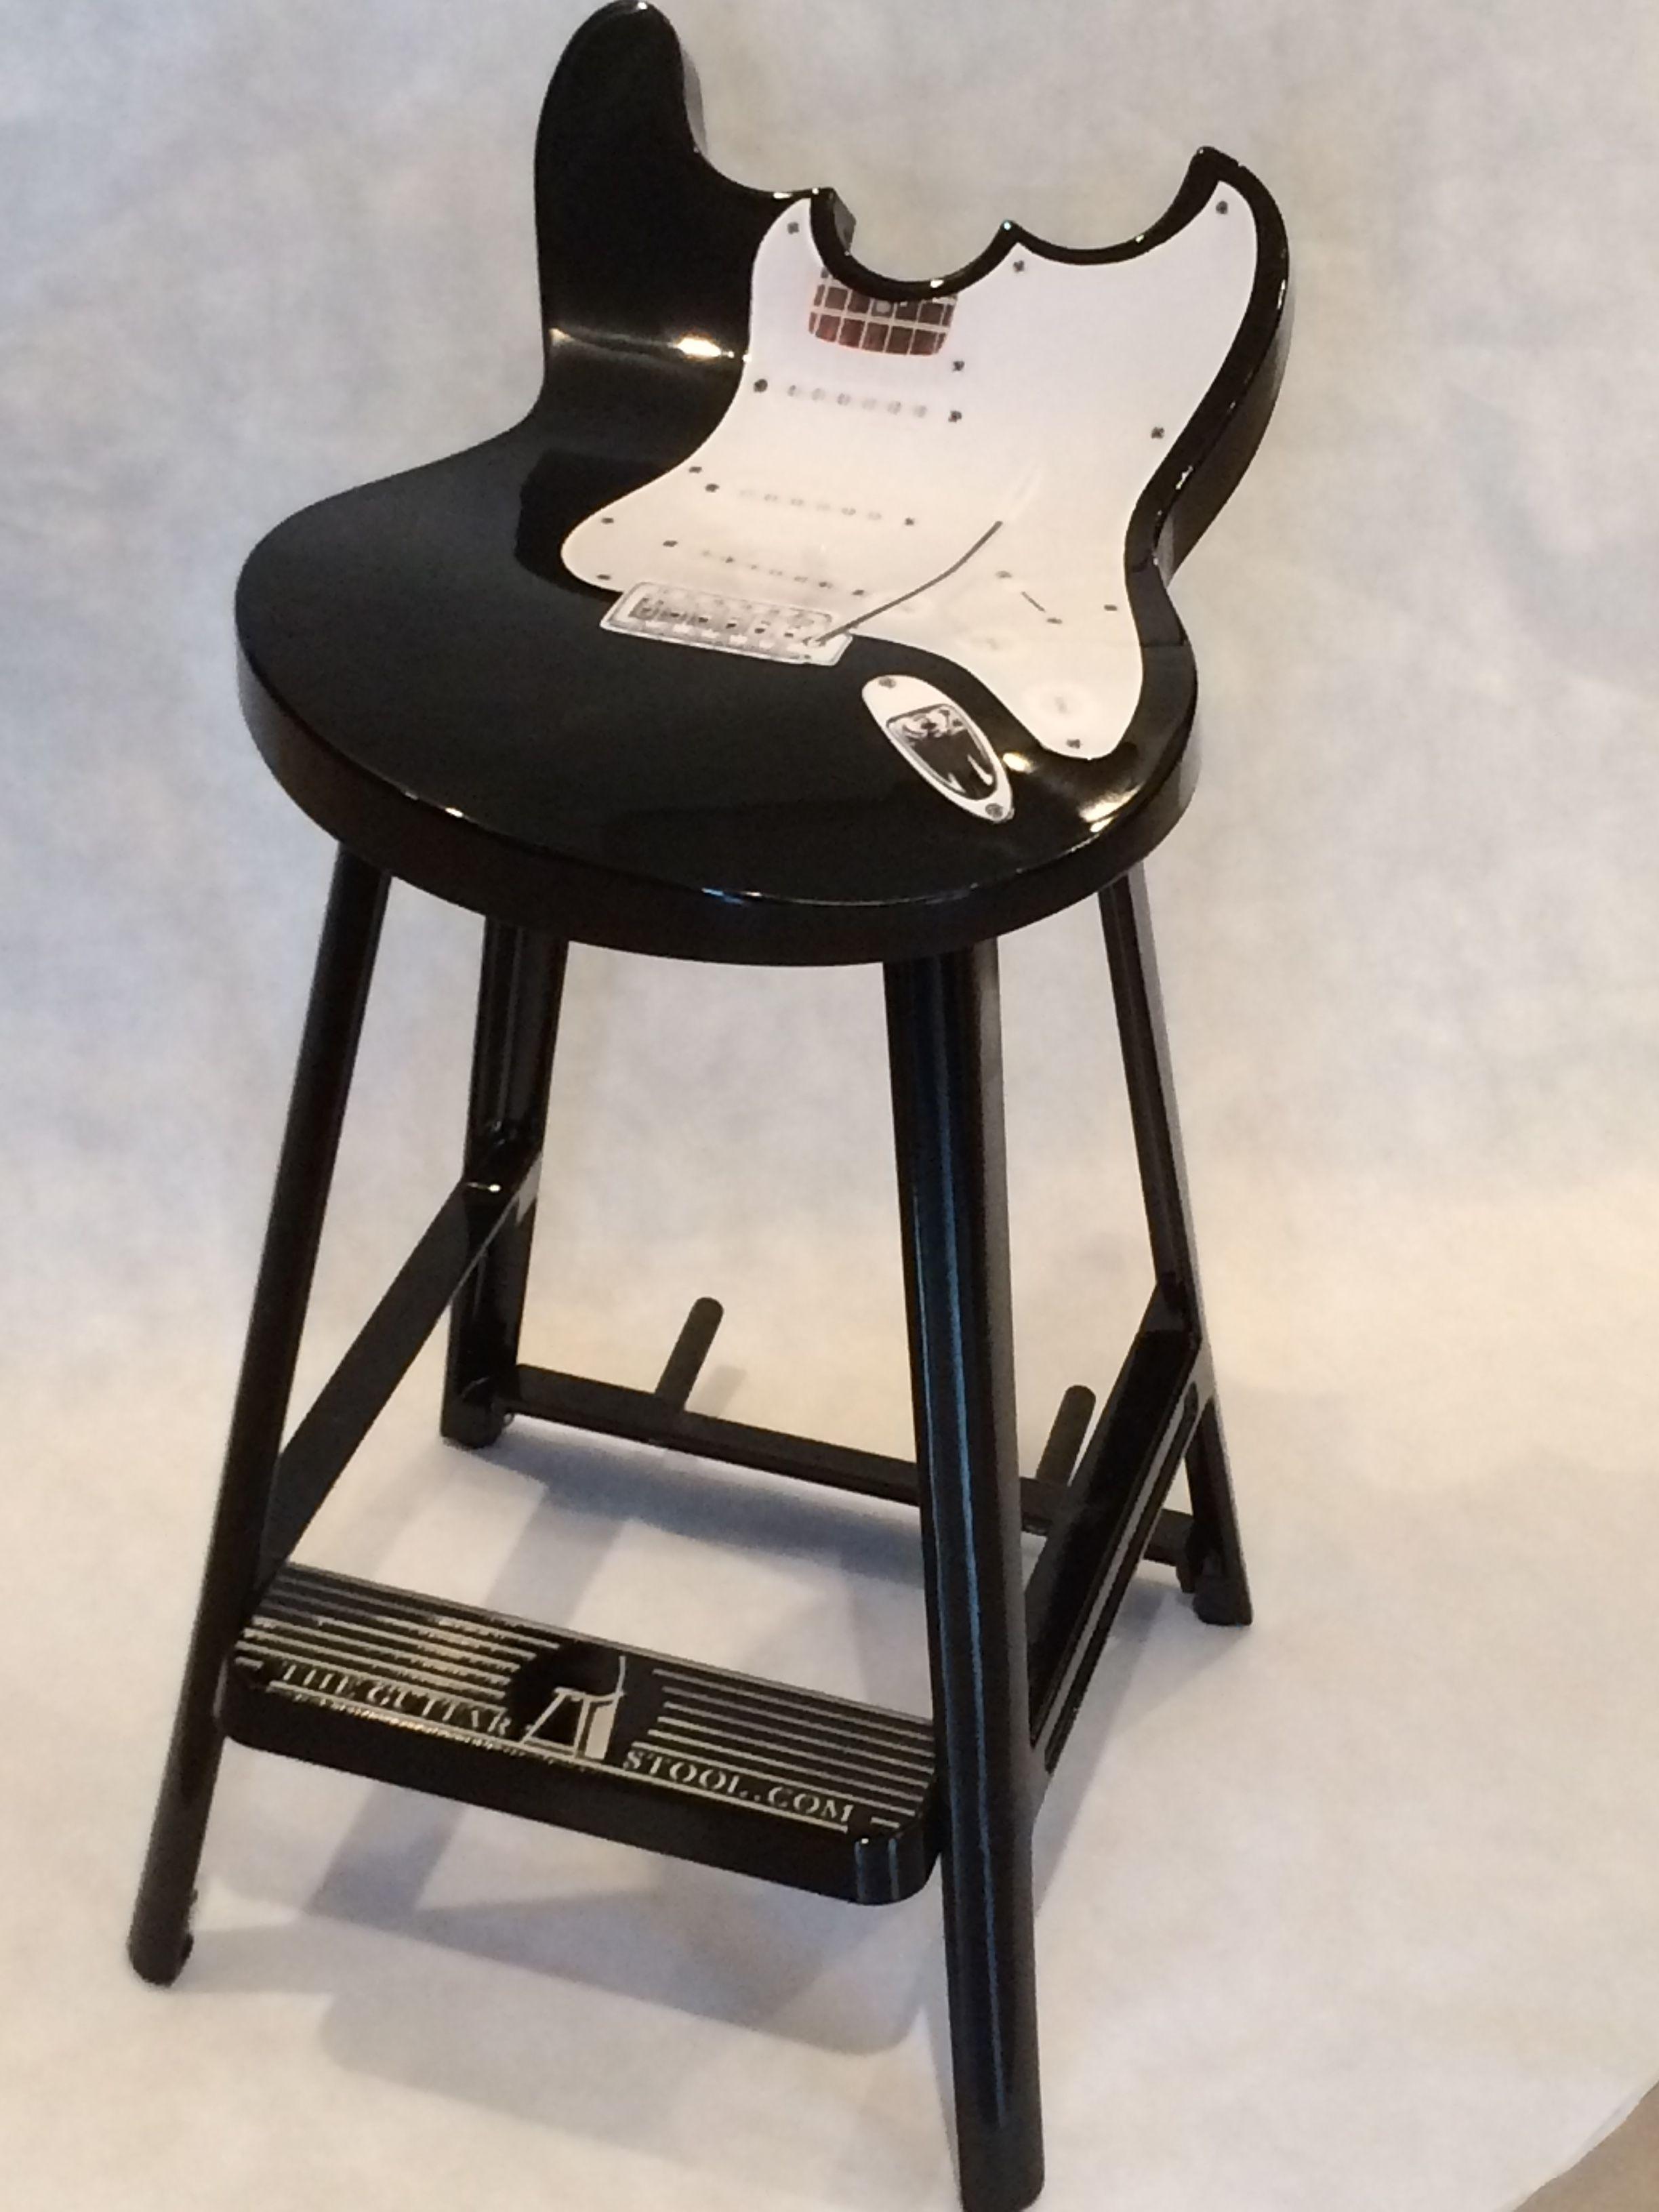 Black guitar stool & Black guitar stool | TheGuitarStool.com | Pinterest | Stools islam-shia.org